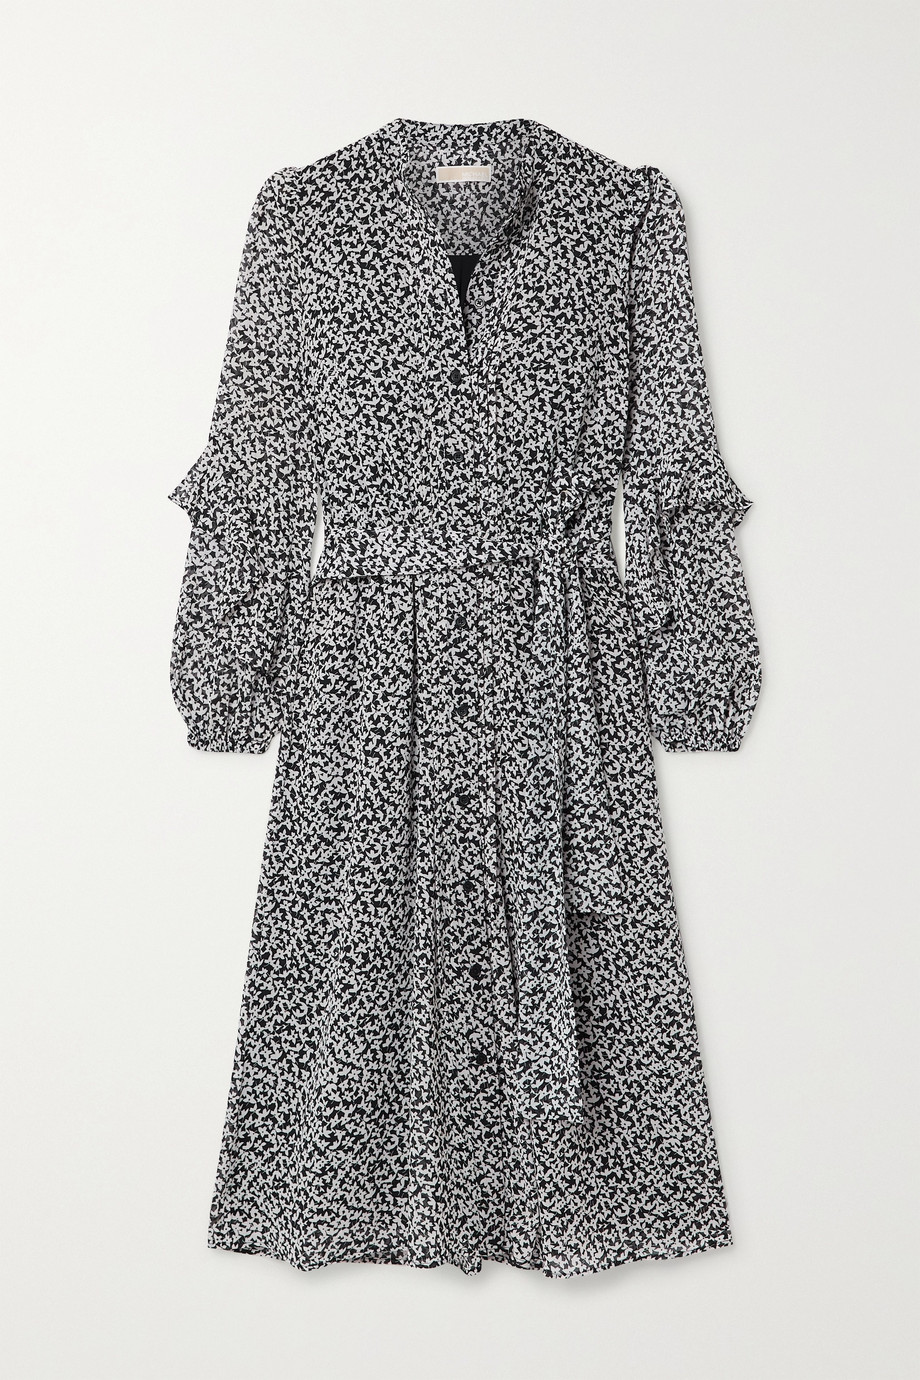 MICHAEL Michael Kors Lilly belted ruffled printed crepe midi dress